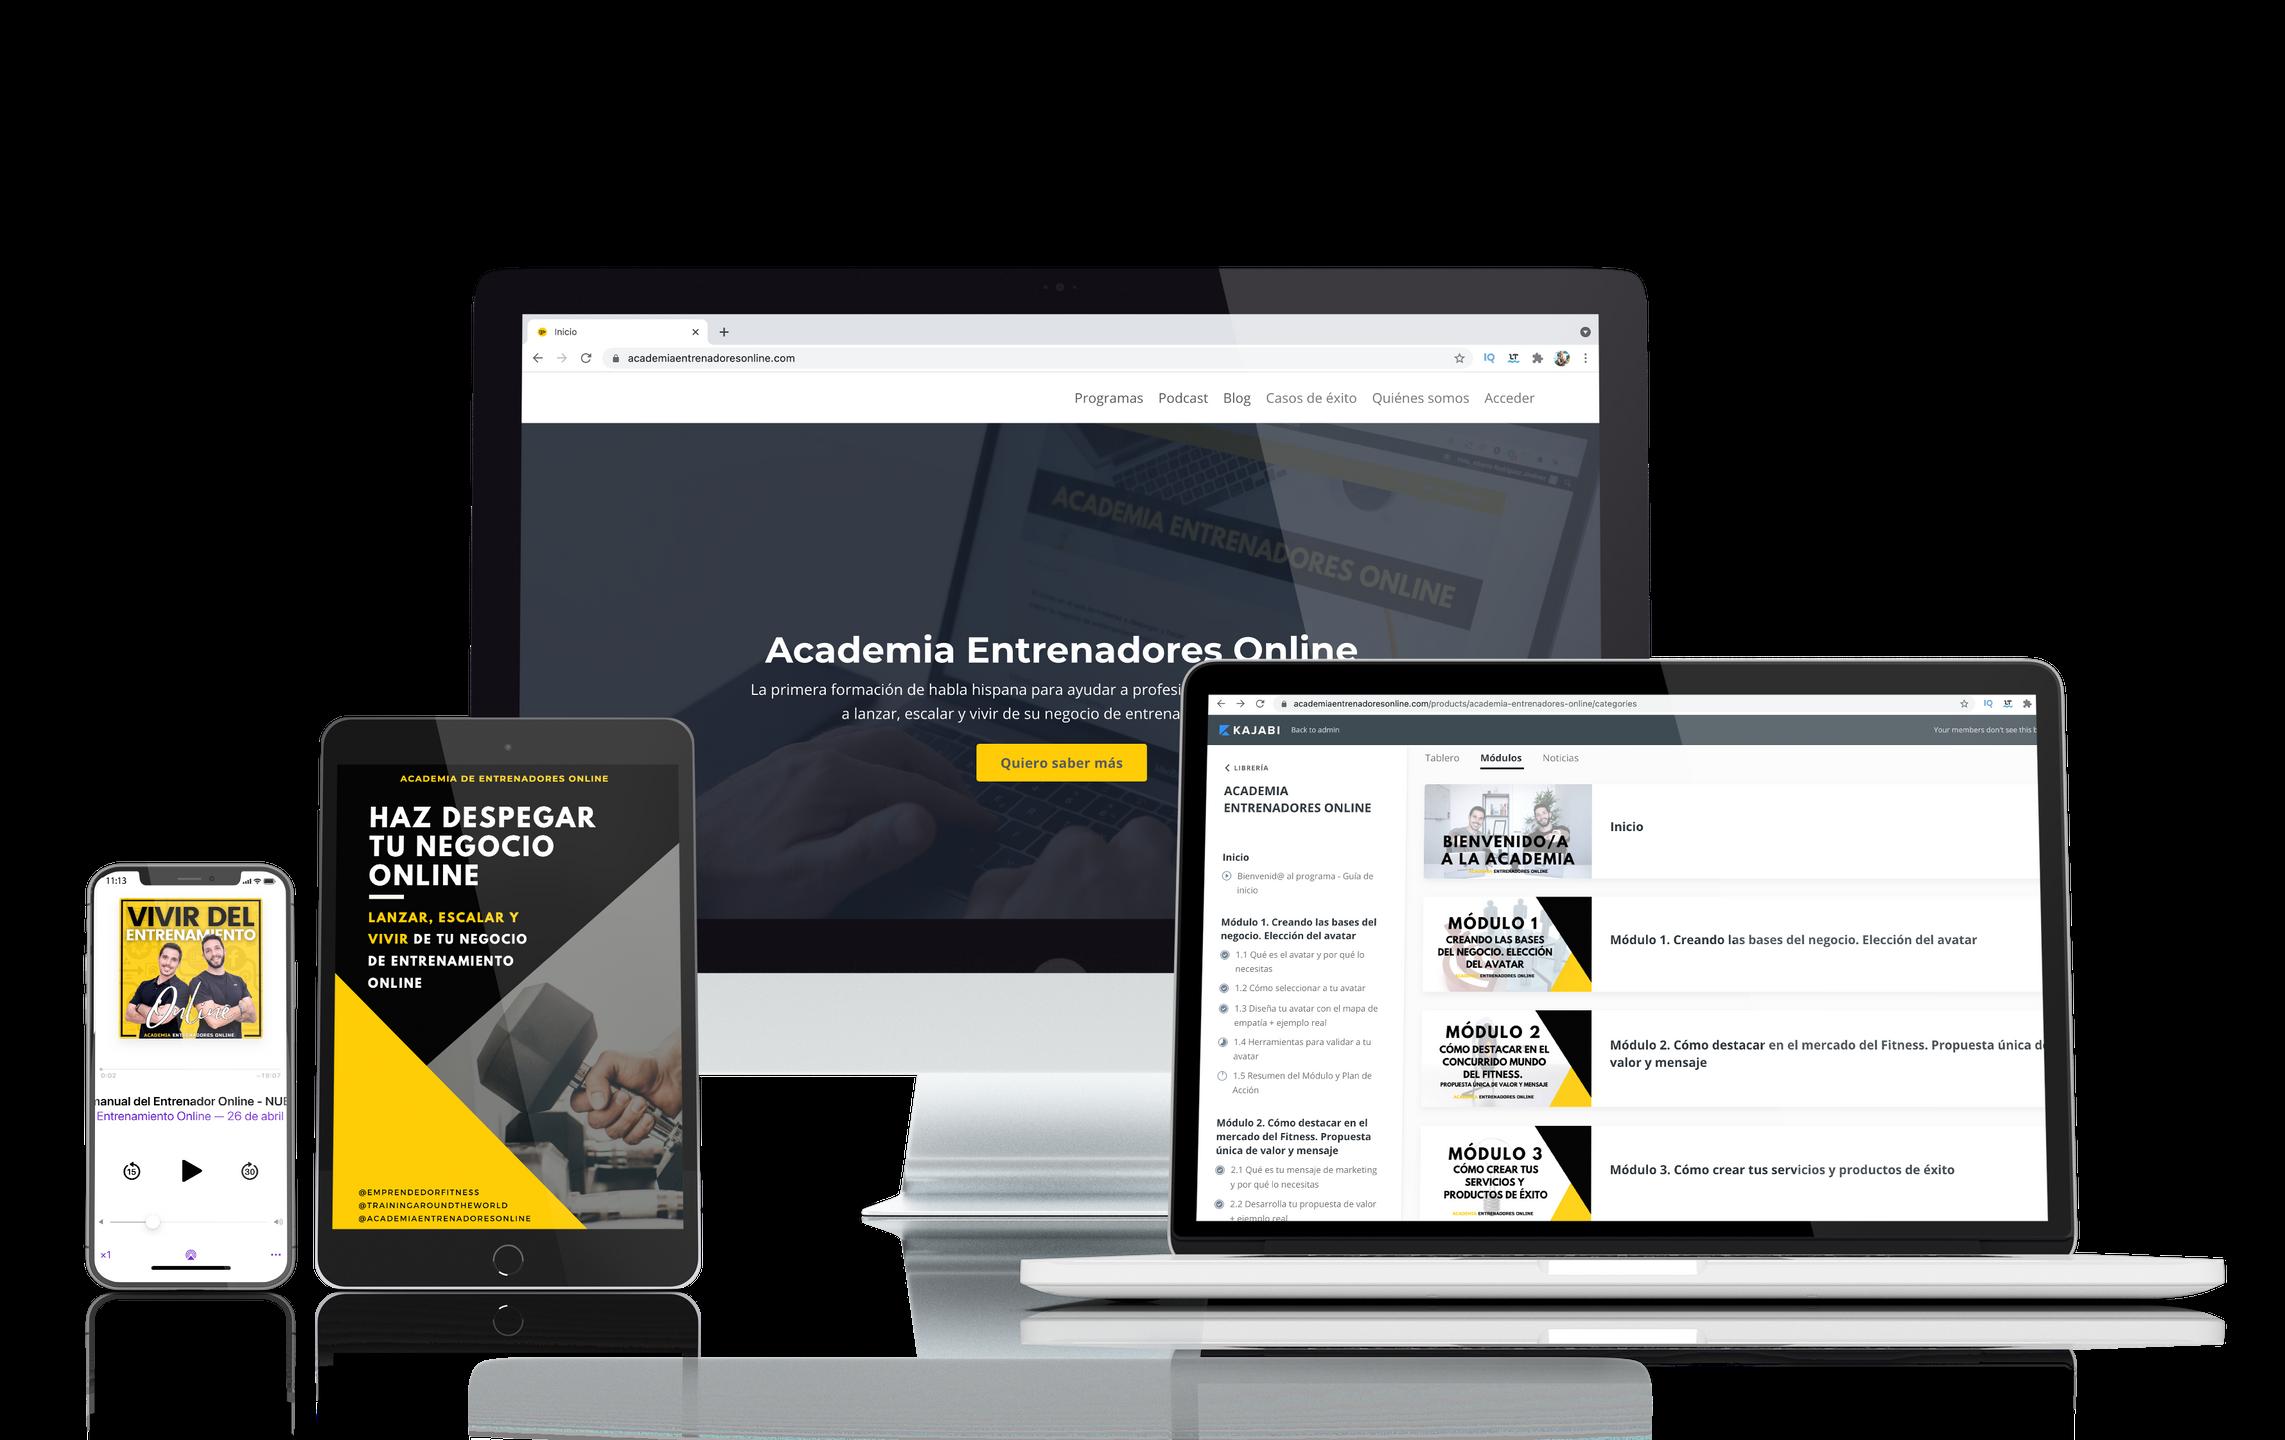 Academia Entrenadores Online